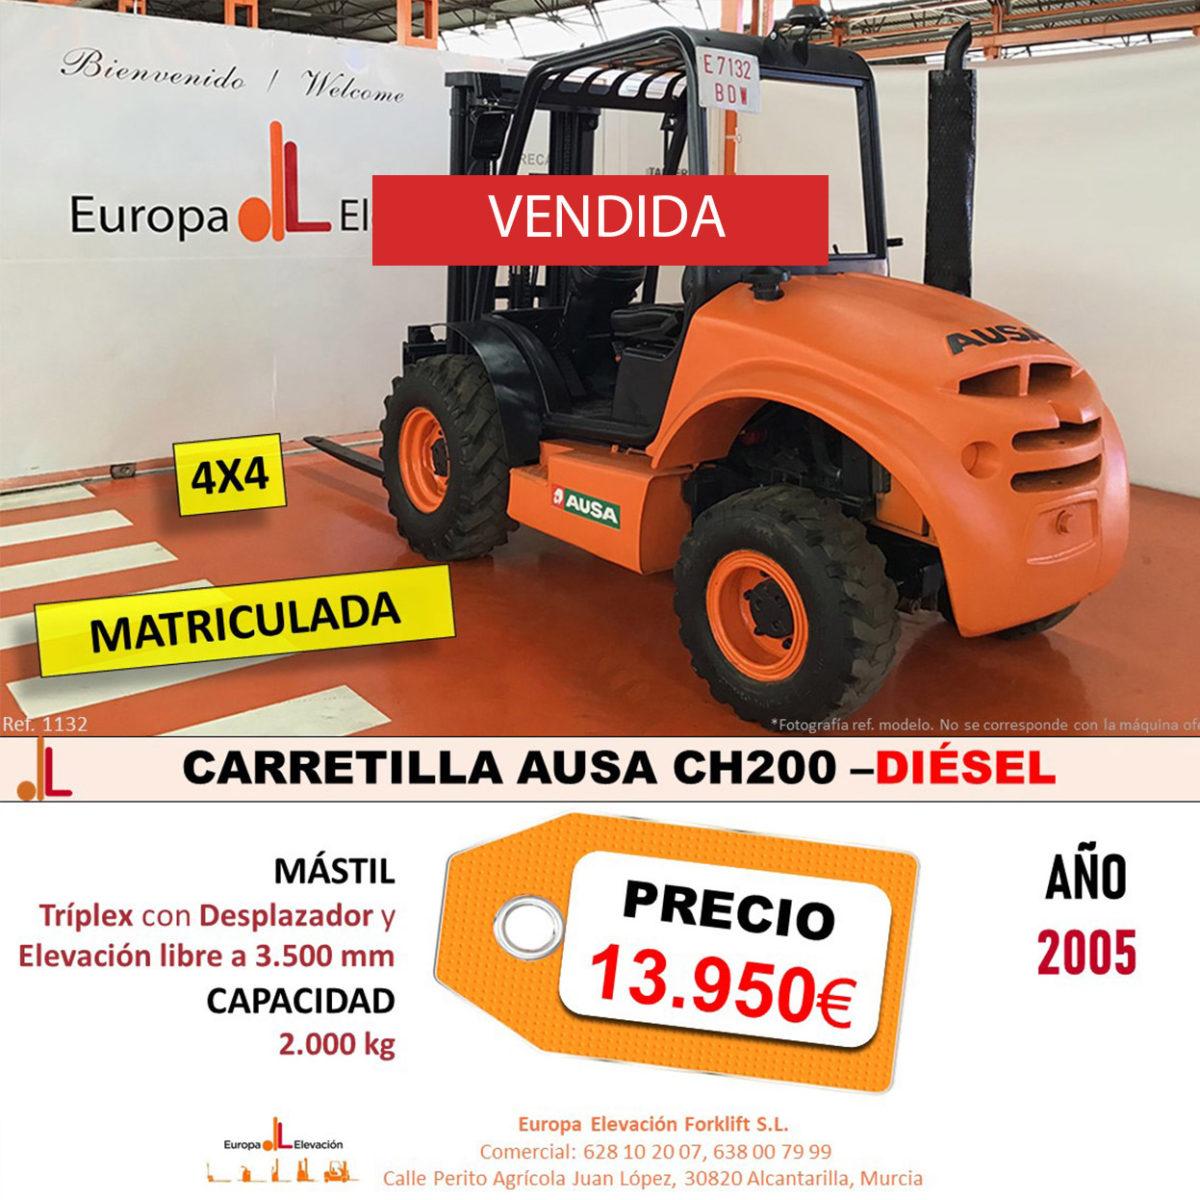 1132 AUSA CH200CARRETILLA 4X4 EUROPA ELEVACIÓN- vendida